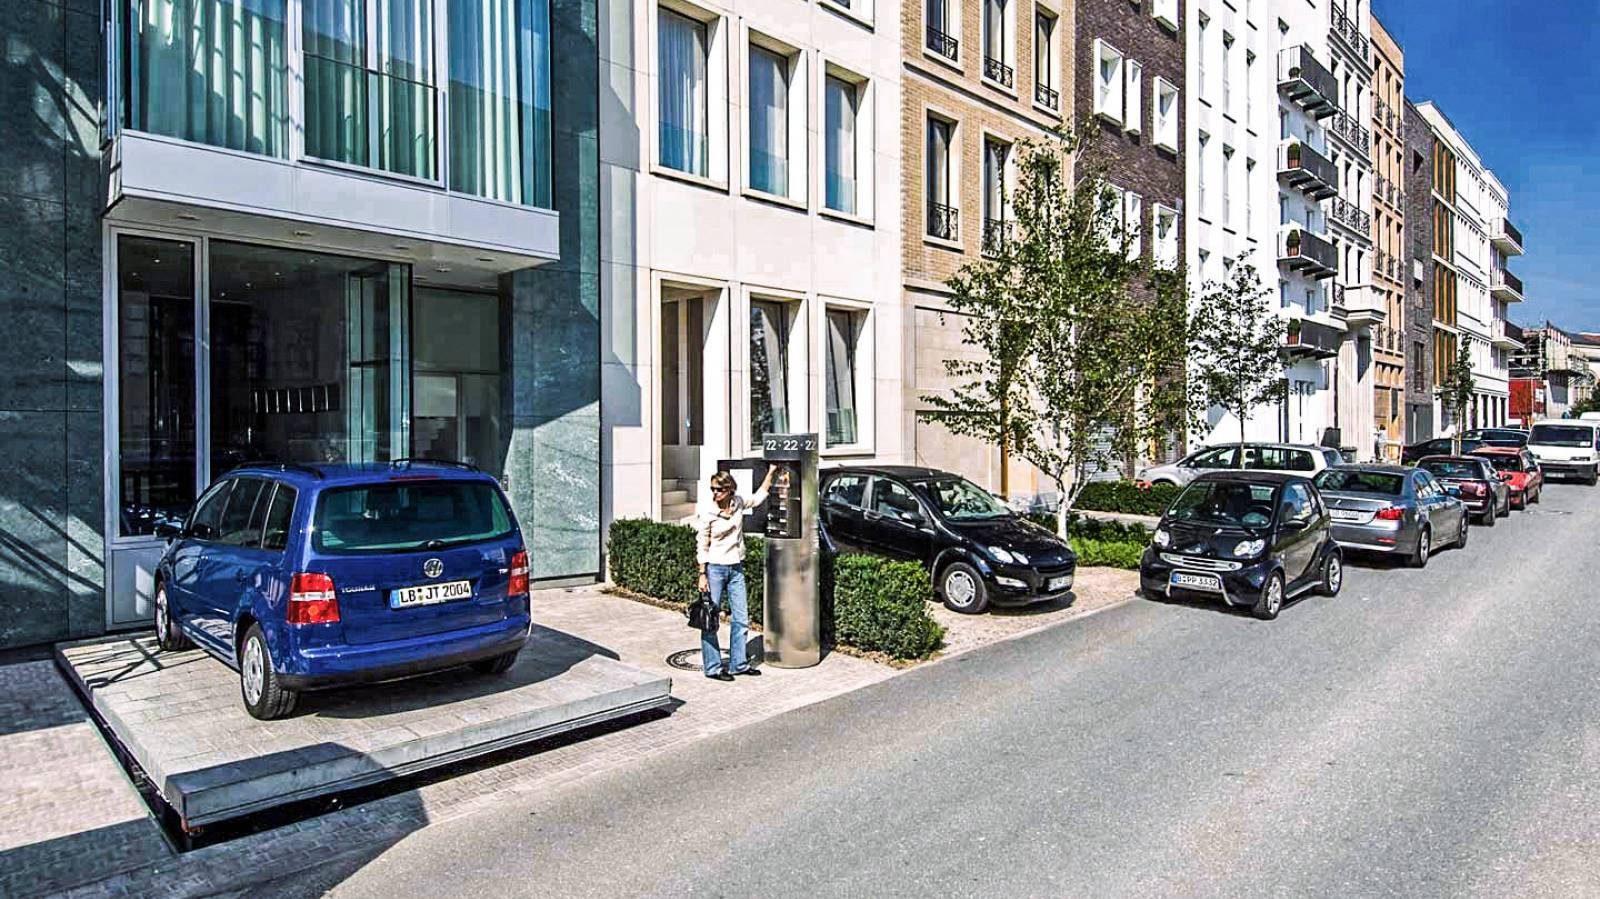 woehr-parklift461-autoparksystem-carparkingsystem-thehidden-3cdfdcce